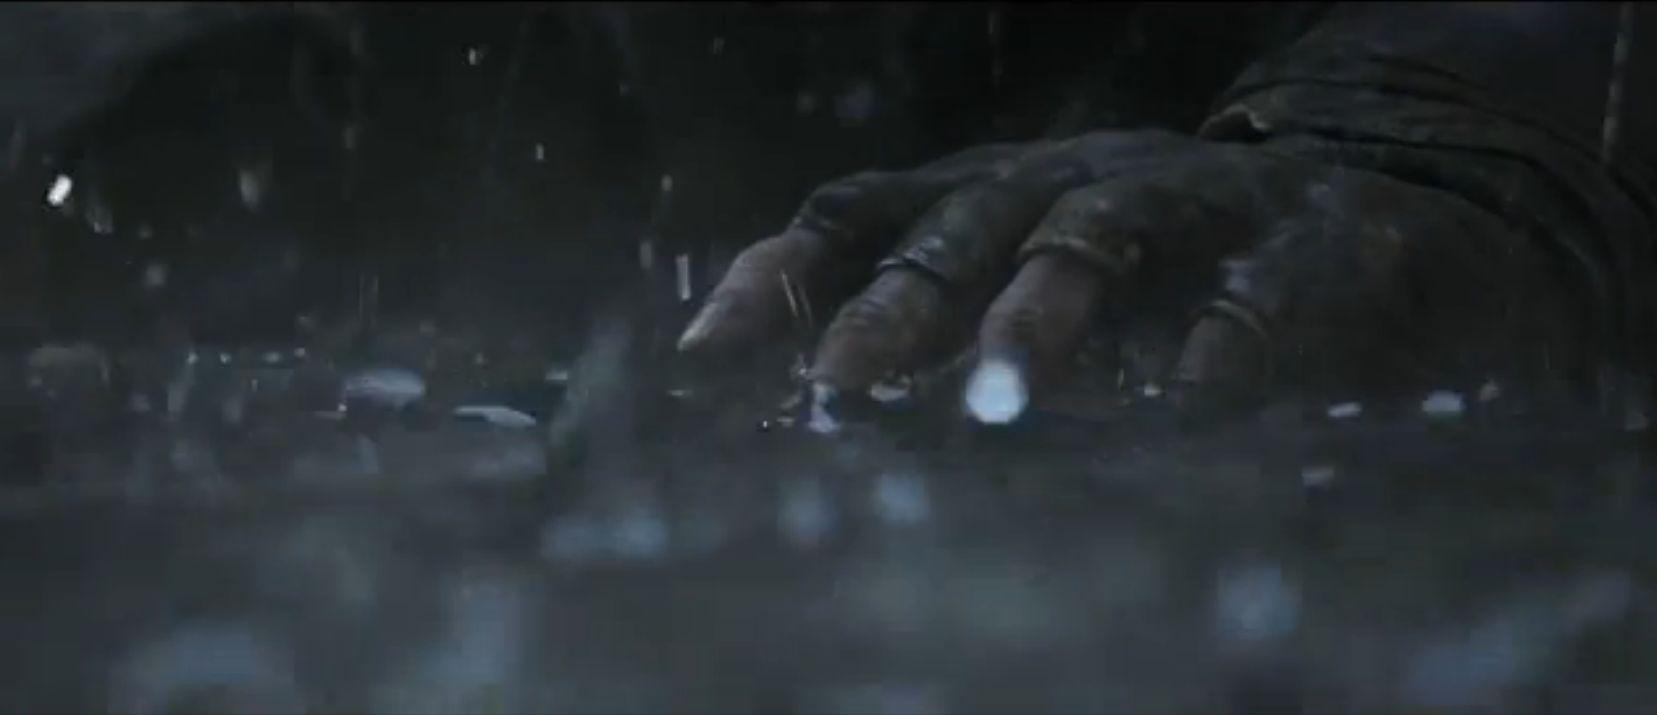 "Dark Souls 2 Cursed Trailer: New Dark Souls II Trailer: Dissecting The ""Curse"""